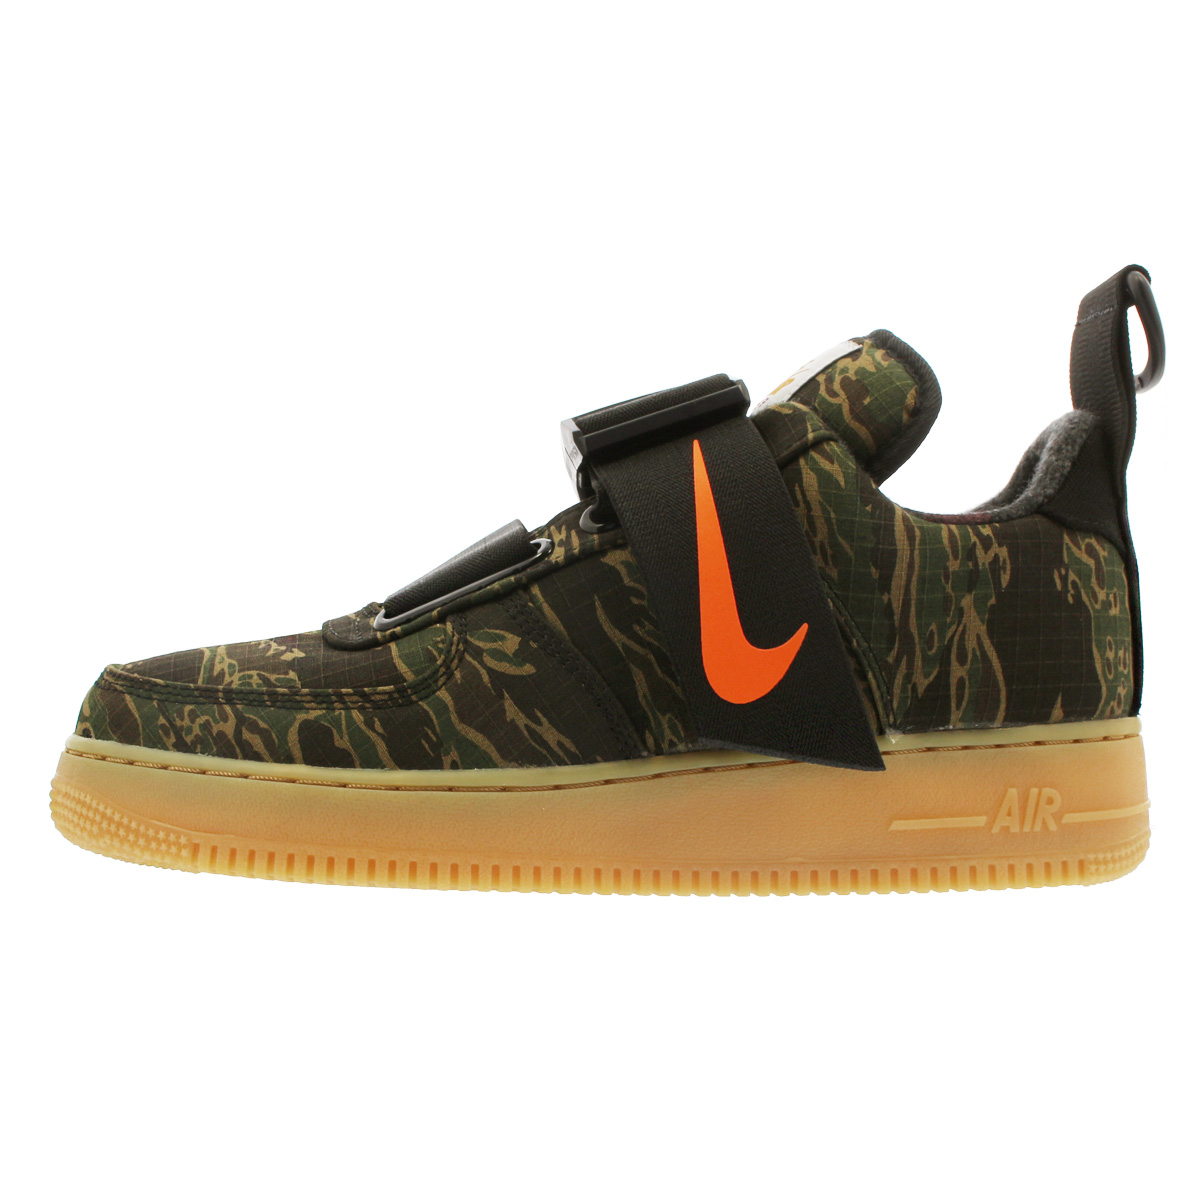 hot sale online ff4a7 2d8c1 NIKE AIR FORCE 1 MID  07 LV8 UTILITY Nike air force 1 mid  07 LV8 utility  OBSIDIAN BLACK TOUR YELLOW WHITE av4112-300